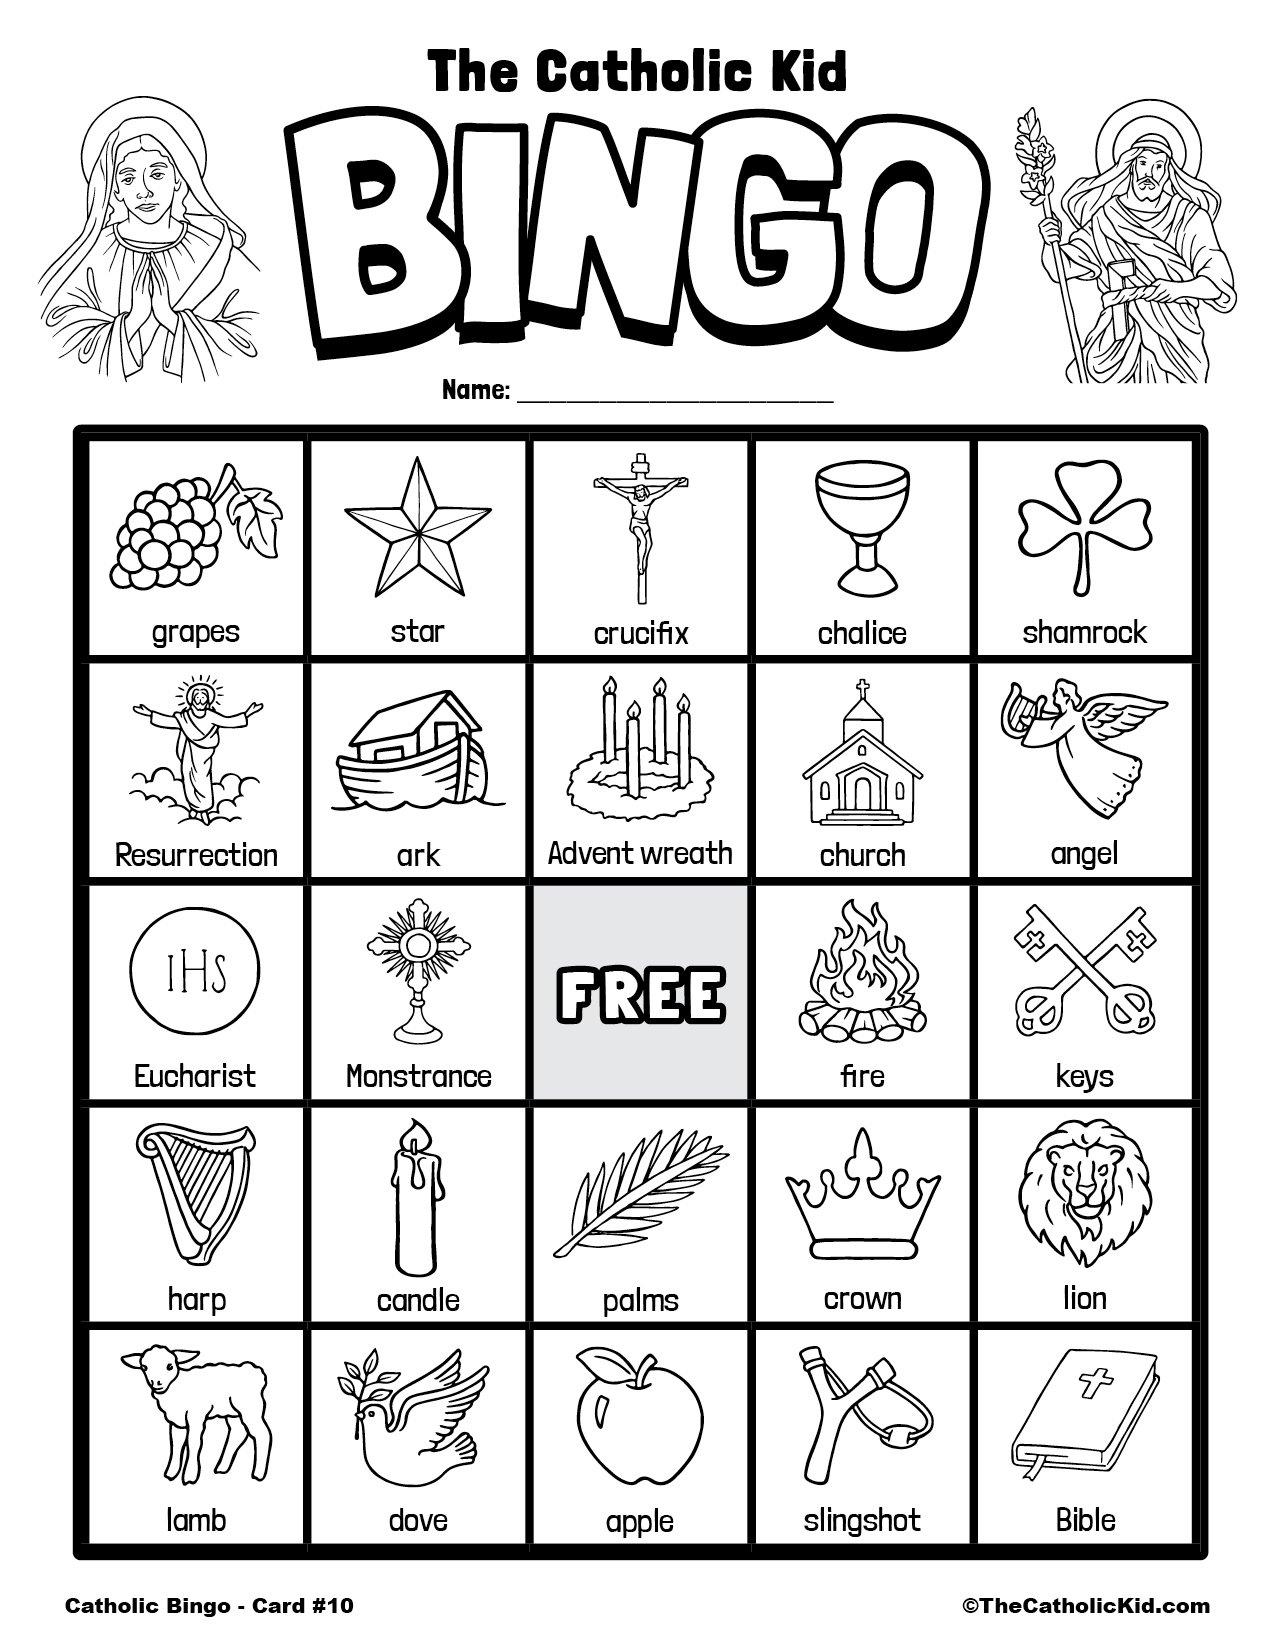 Free Printable Catholic Bingo Game Card - 10